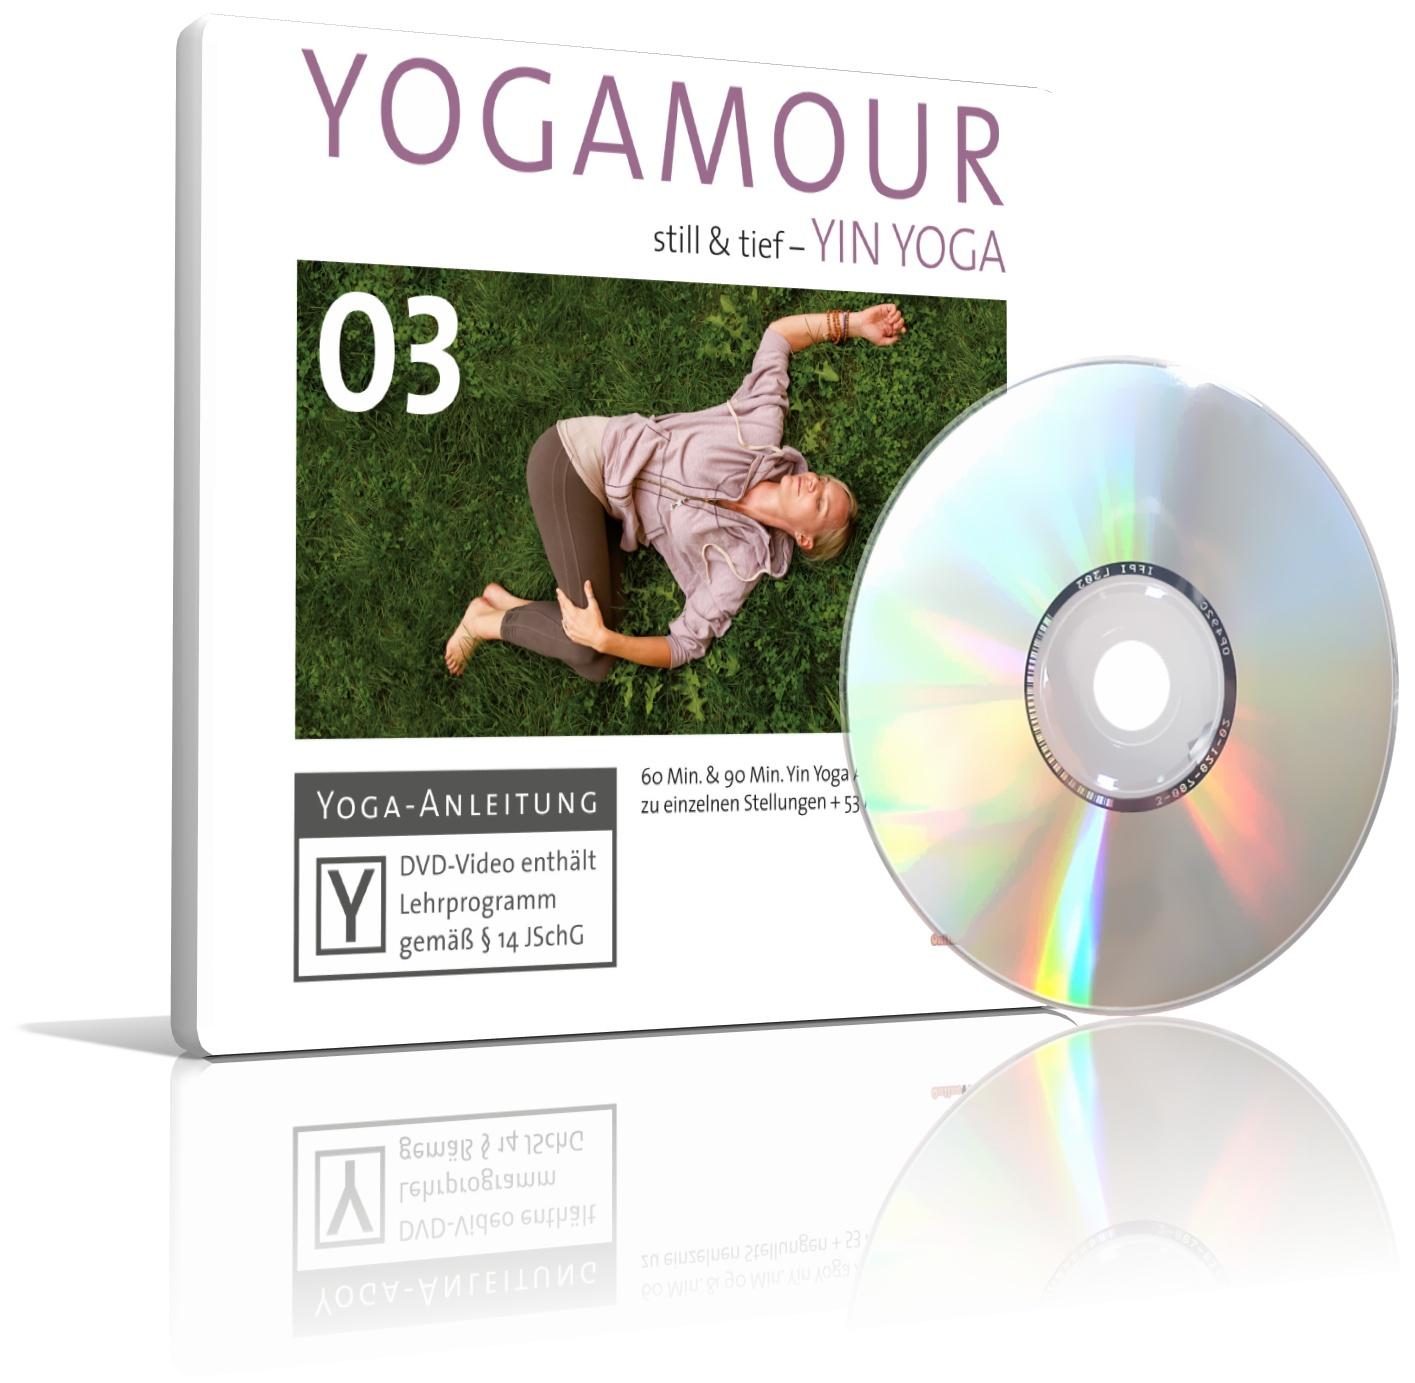 Yin Yoga, still & tief von YOGAMOUR (DVD) im YOGISHOP kaufen | Yoga, Yogamatten & Yoga-Zubehör